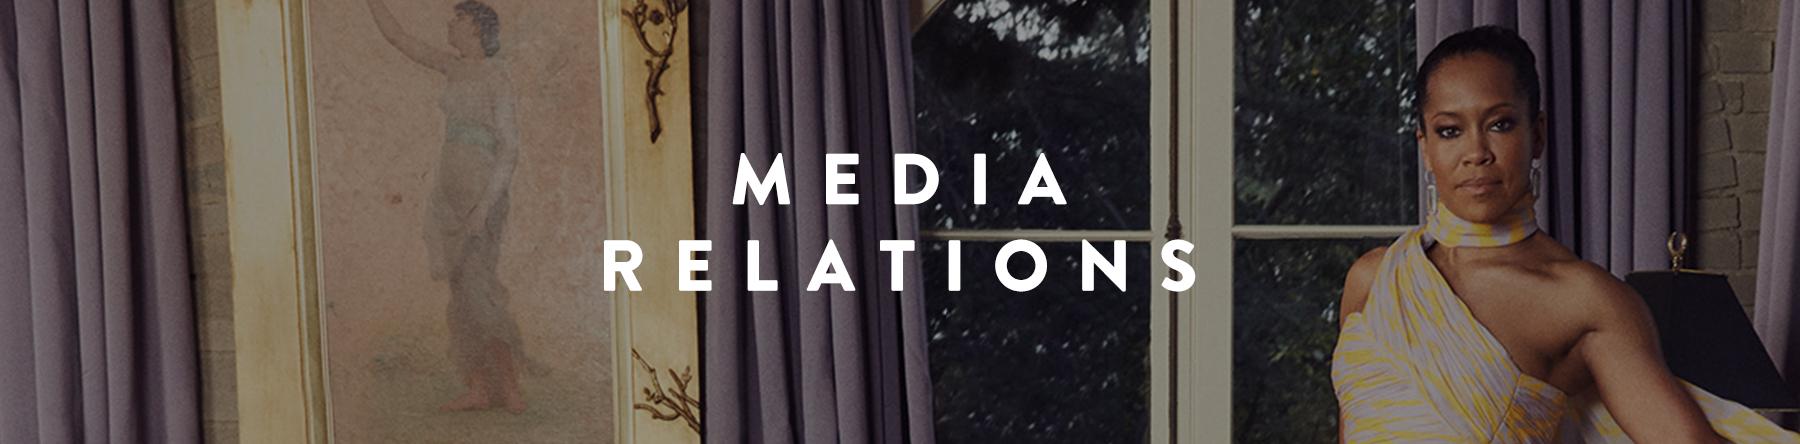 mediarelations.jpg